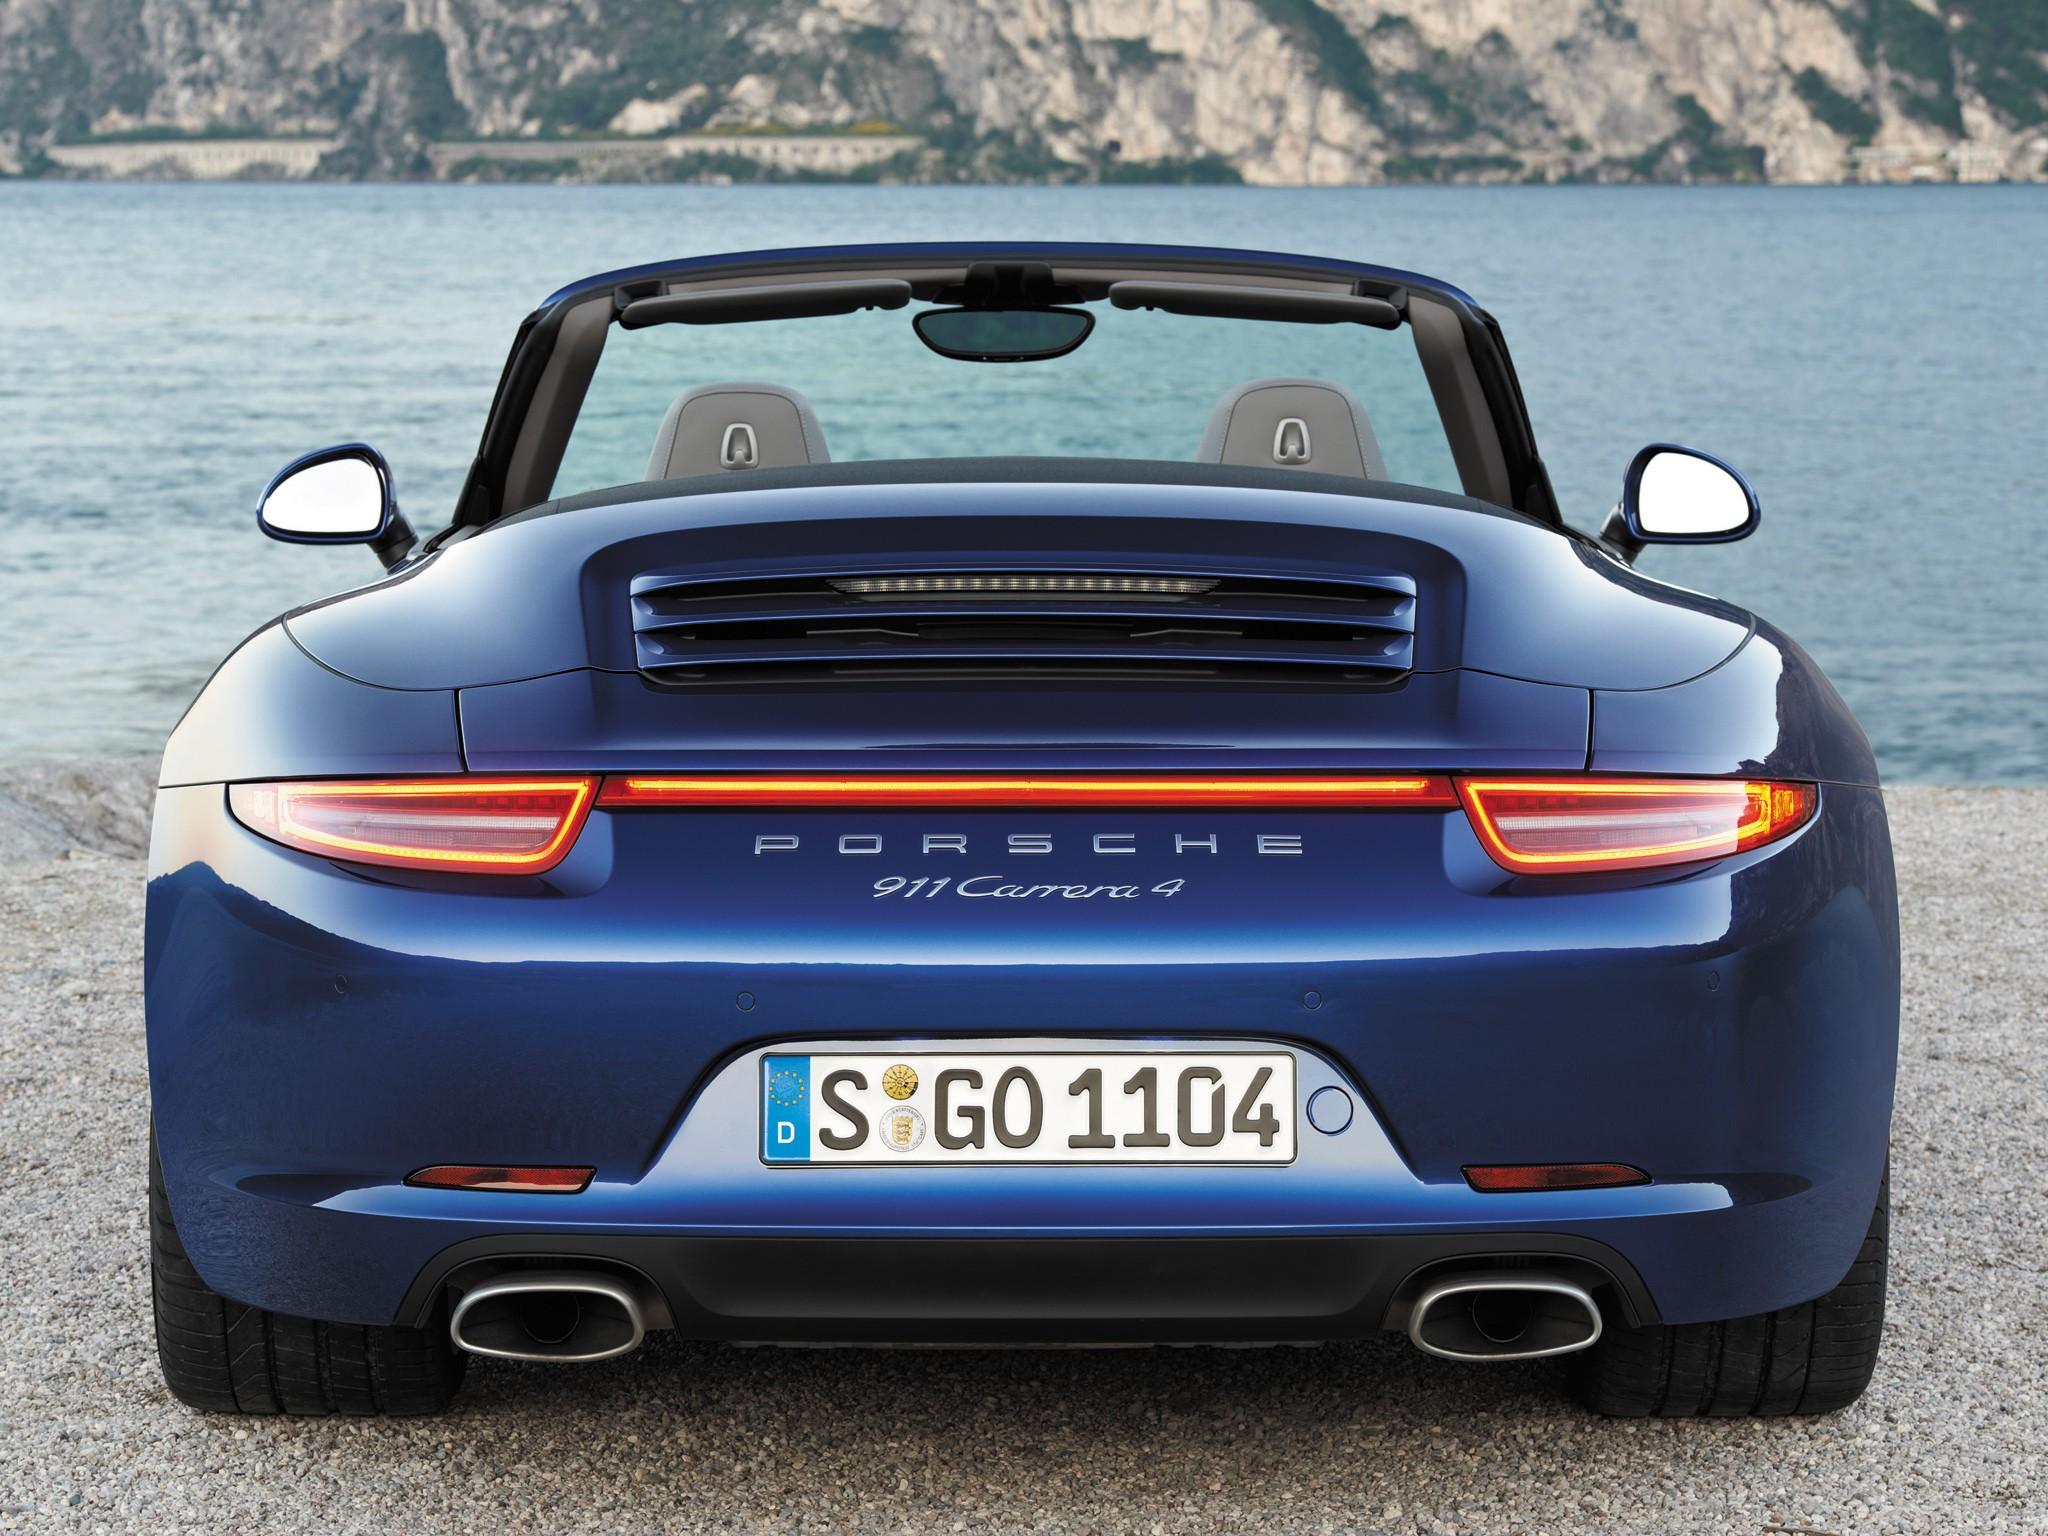 porsche 911 carrera 4 cabriolet 991 specs photos 2012 2013 2014 2015 2016 2017 2018. Black Bedroom Furniture Sets. Home Design Ideas